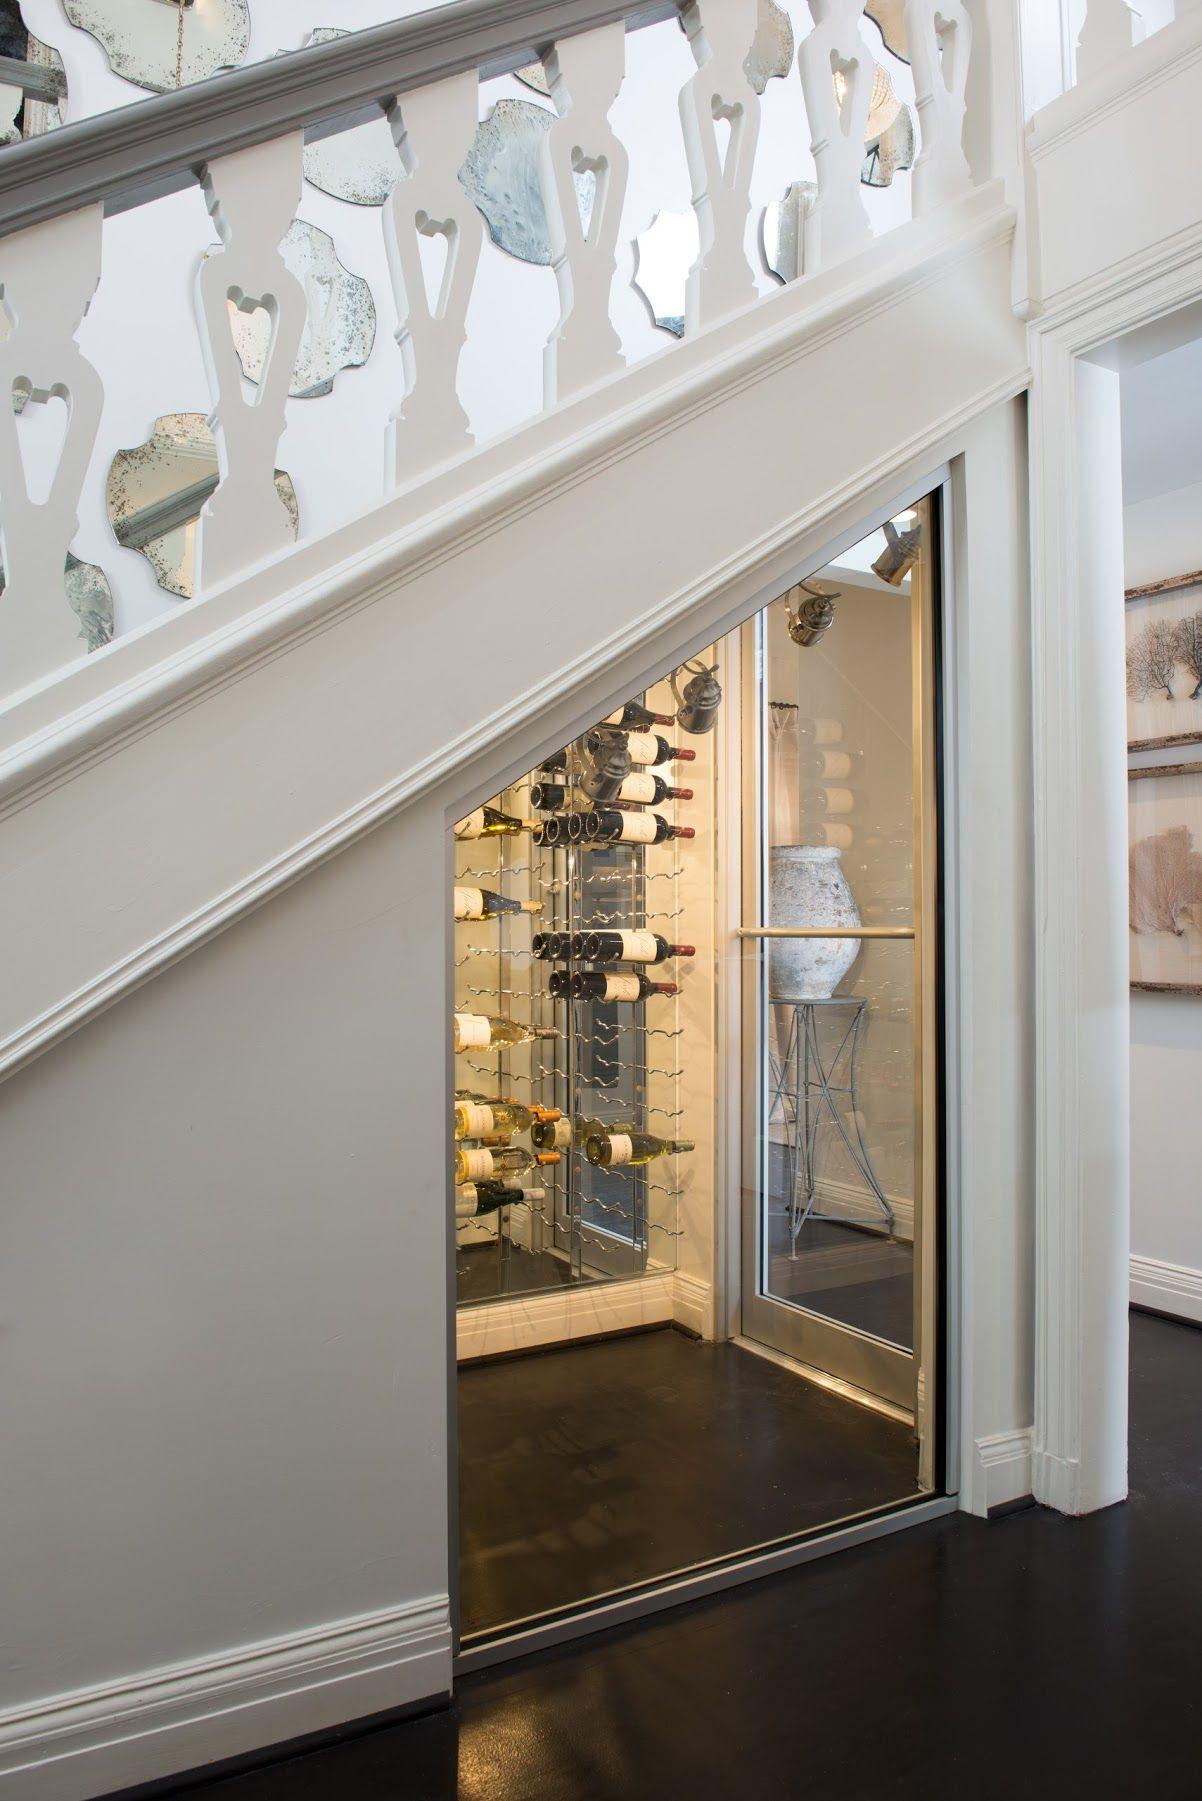 Underneath The Stairs, Randal Created An Ingenious Wine Cellar! COTE DE  TEXAS: AIDAN GRAY WITH AN EDGE #AGWITHANEDGE